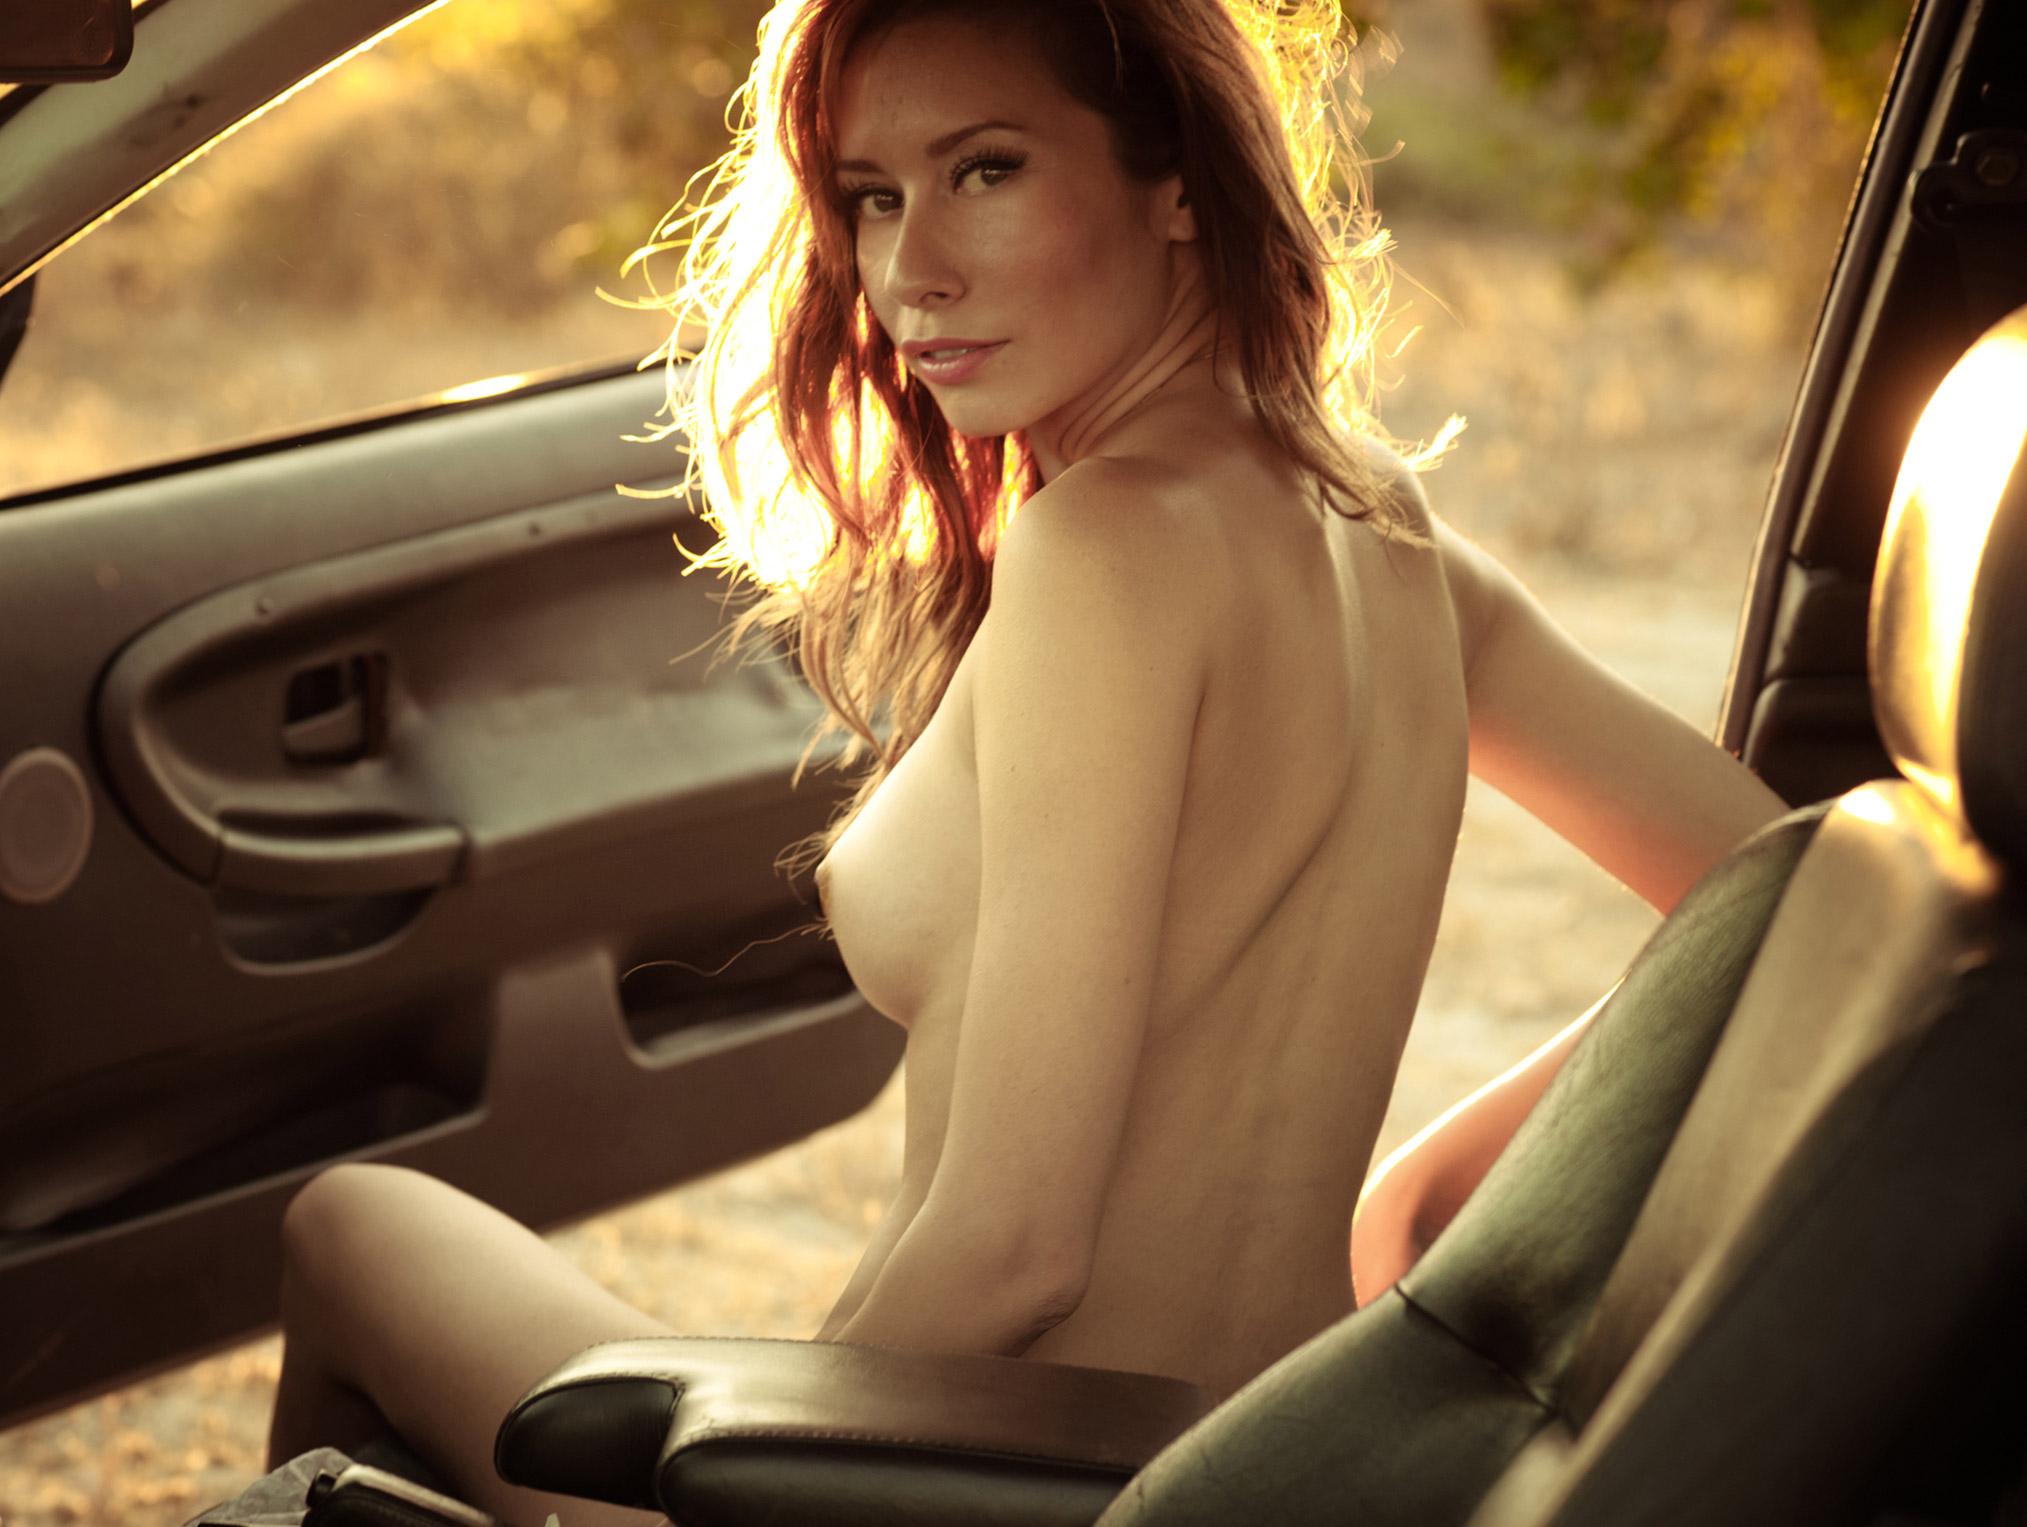 Leena nude by Mortonovich / Naked Magazine